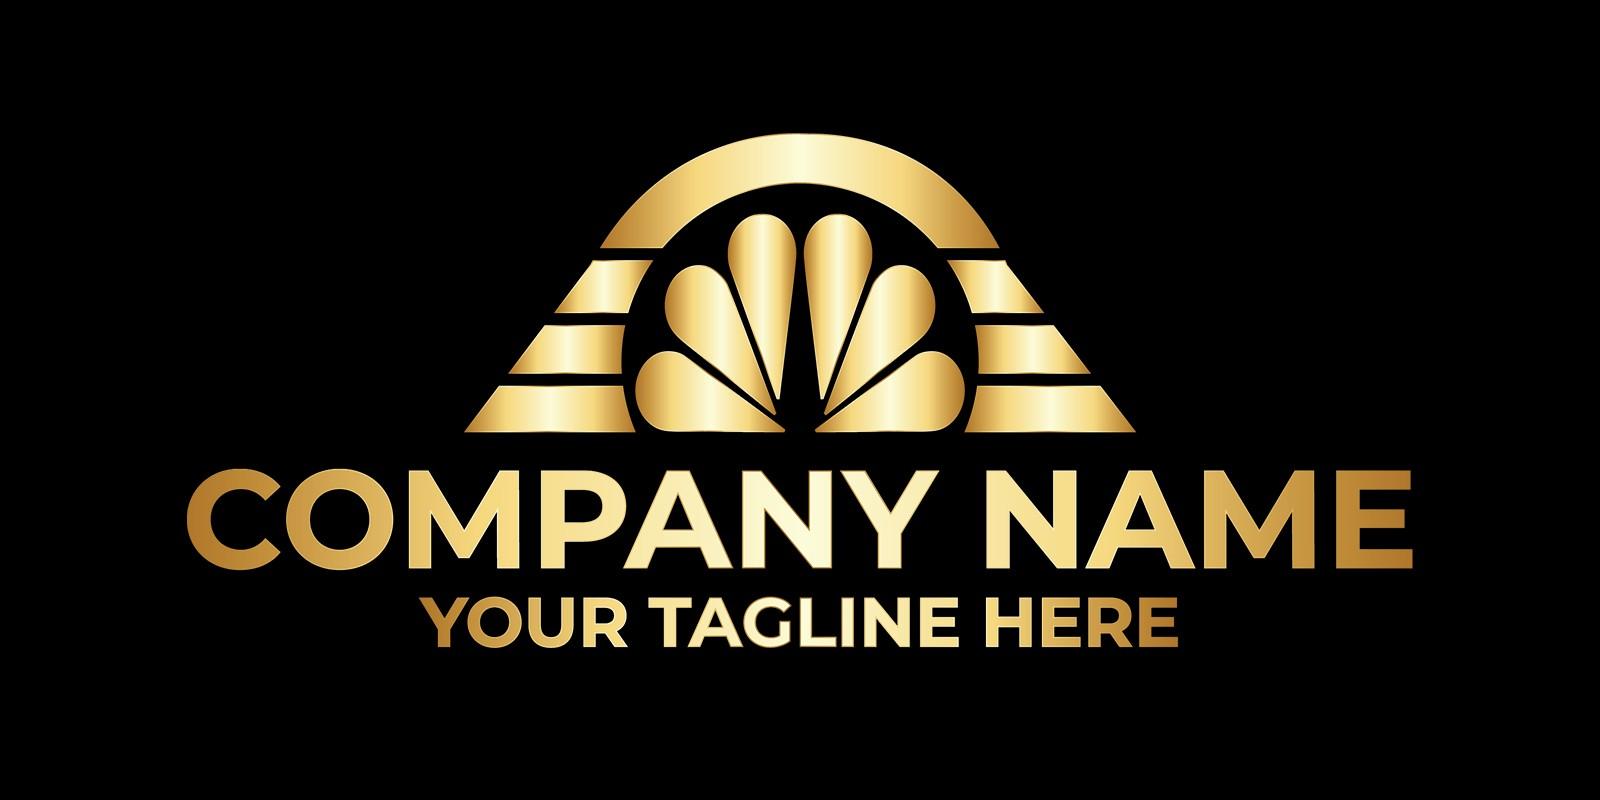 Print Ready Logo Design